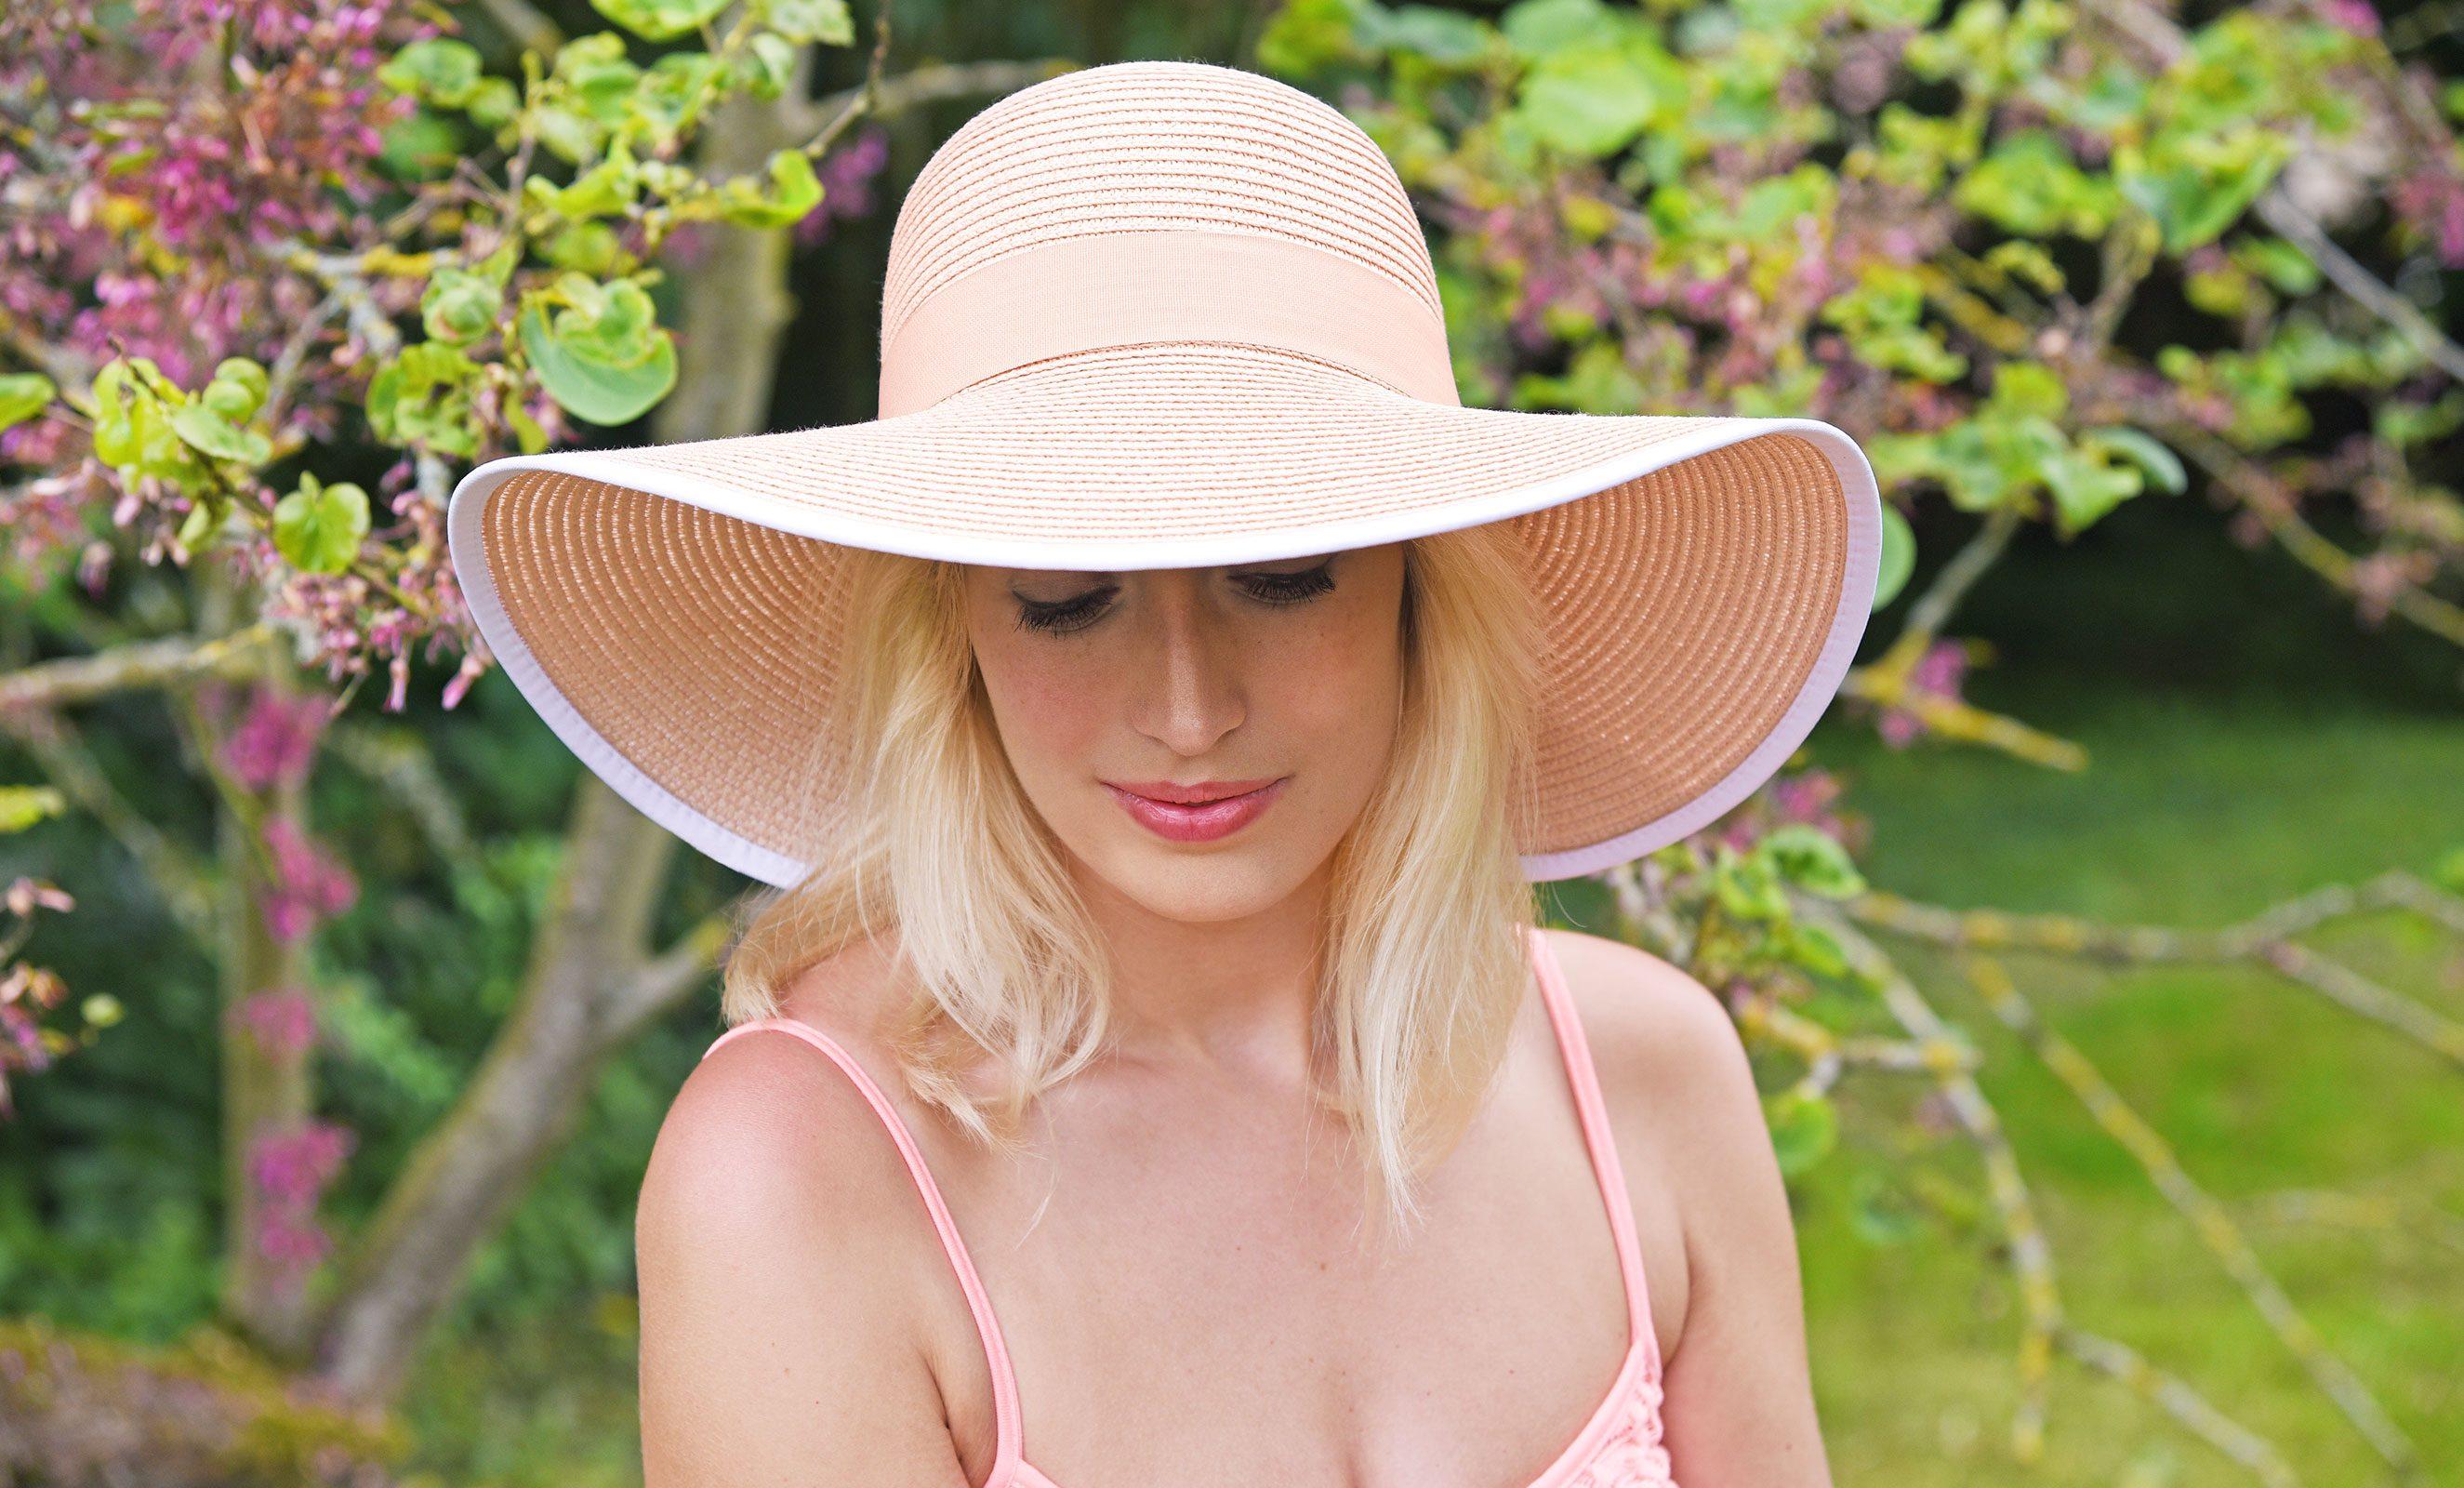 http://lookbook.allee-du-foulard.fr/wp-content/uploads/2018/06/0676-ADF-Accessoires-de-mode-LB-Chapeaux_champetre-reynosa-rose-2650x1600.jpg